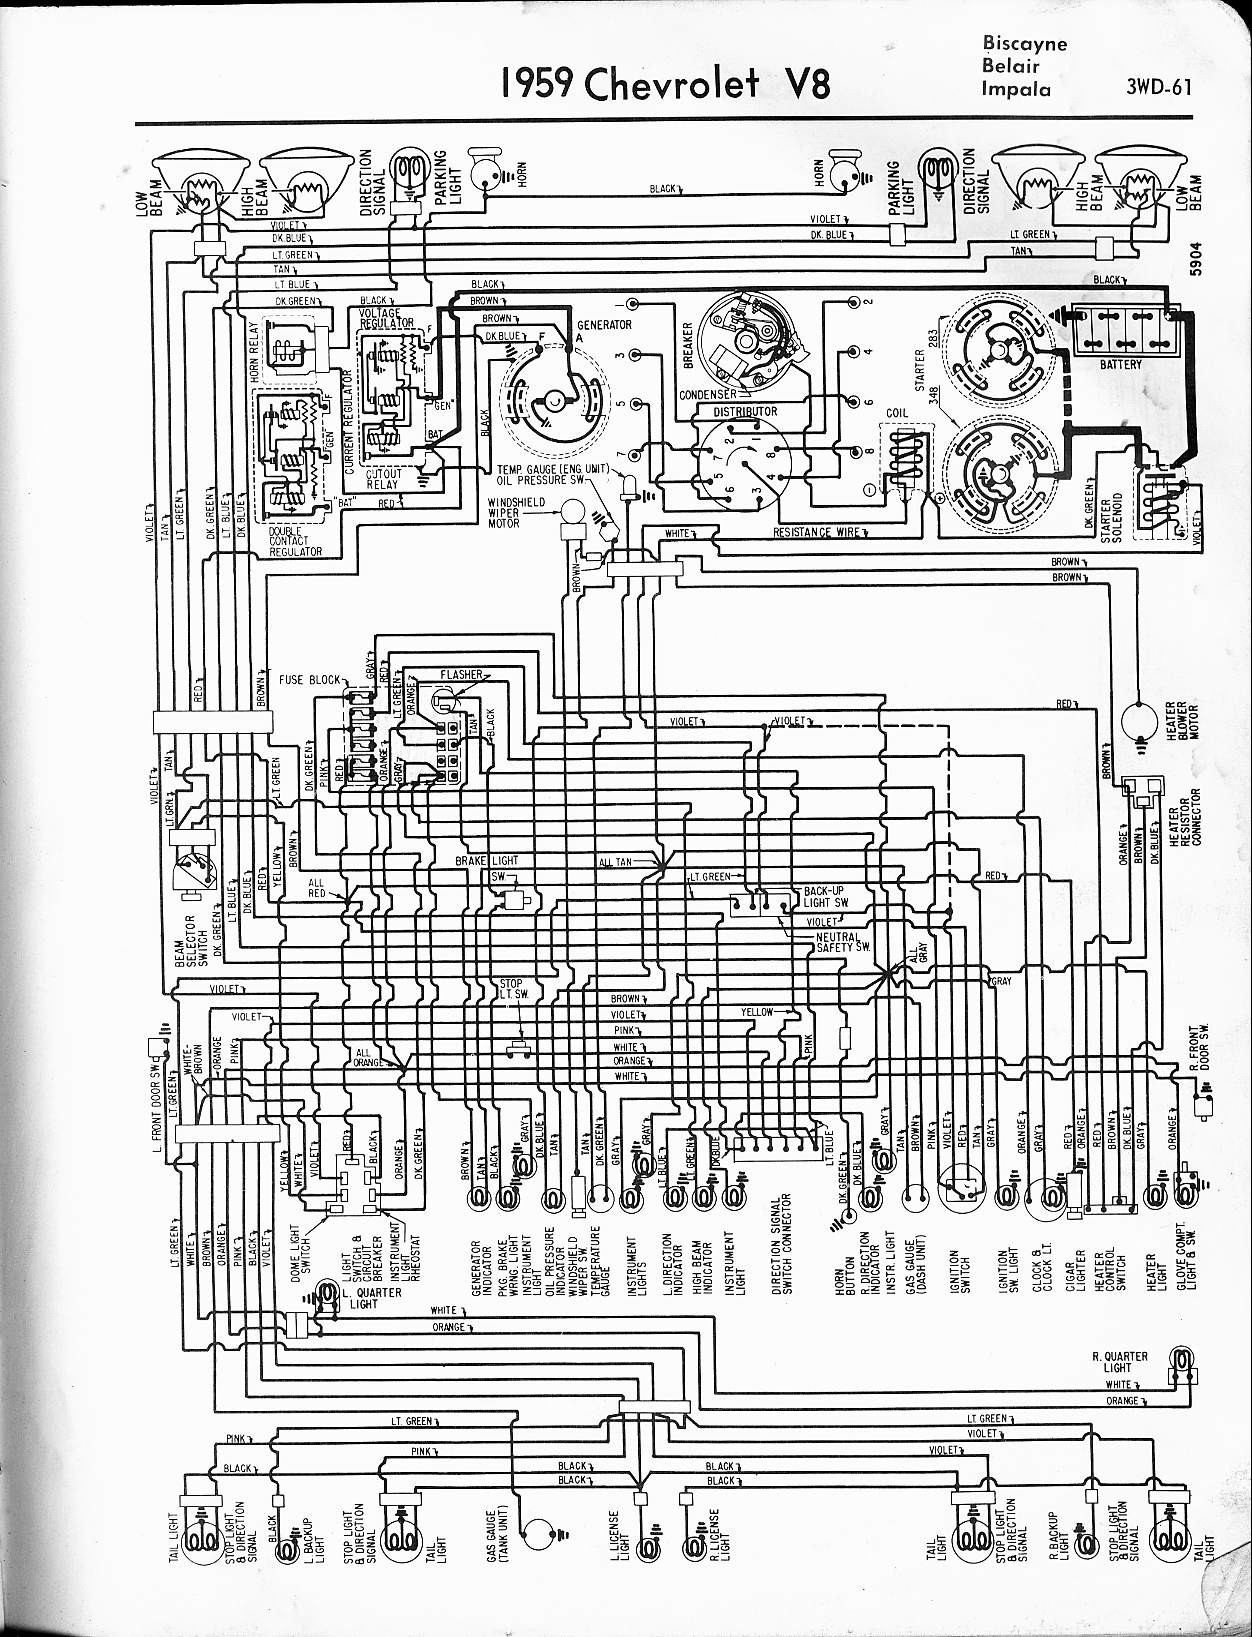 2000 Chevy Impala 3 4 Engine Diagram 57 65 Chevy Wiring Diagrams Of 2000 Chevy Impala 3 4 Engine Diagram